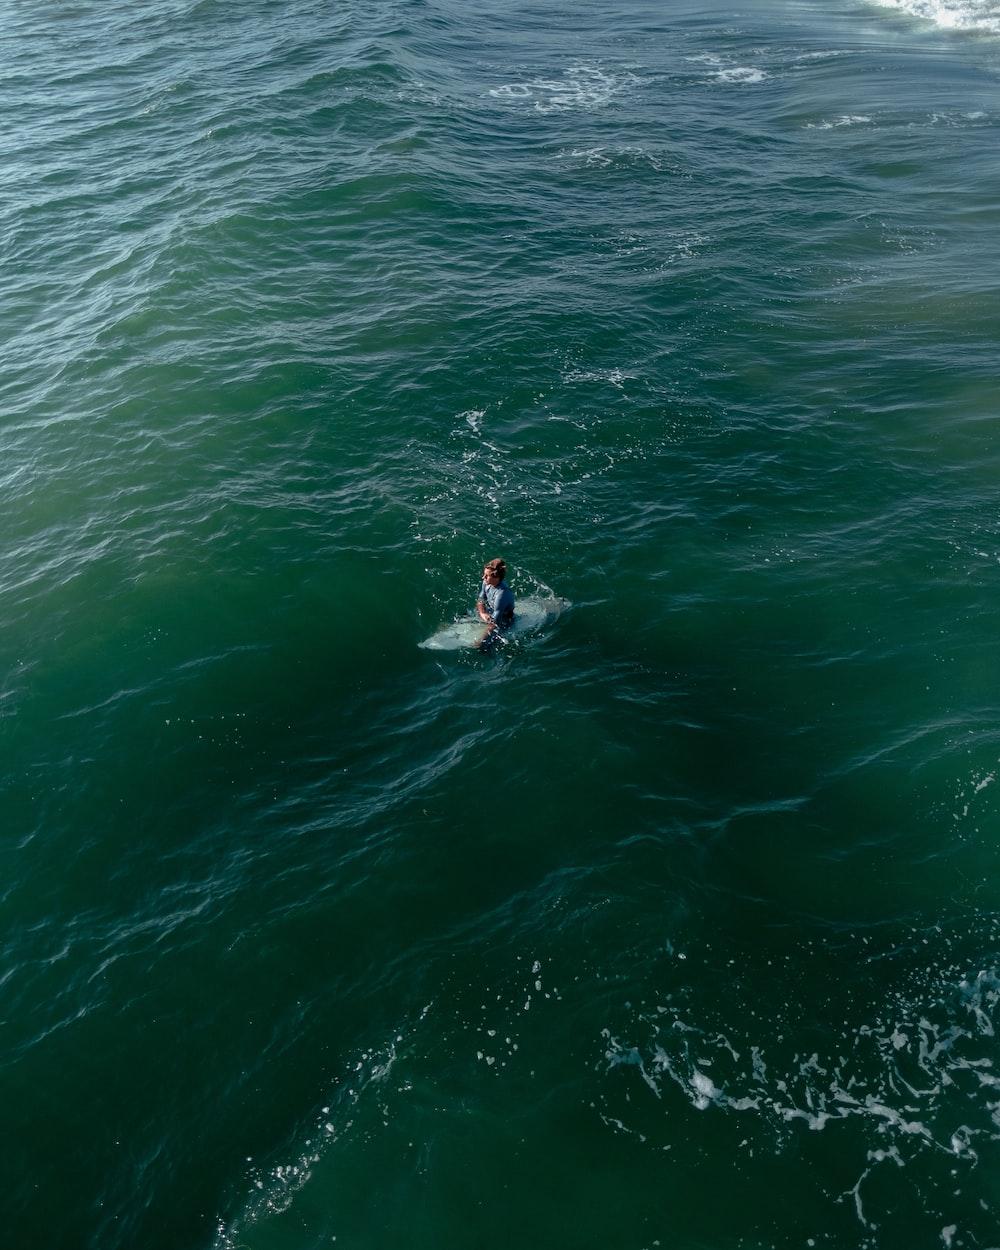 perspn on surf board